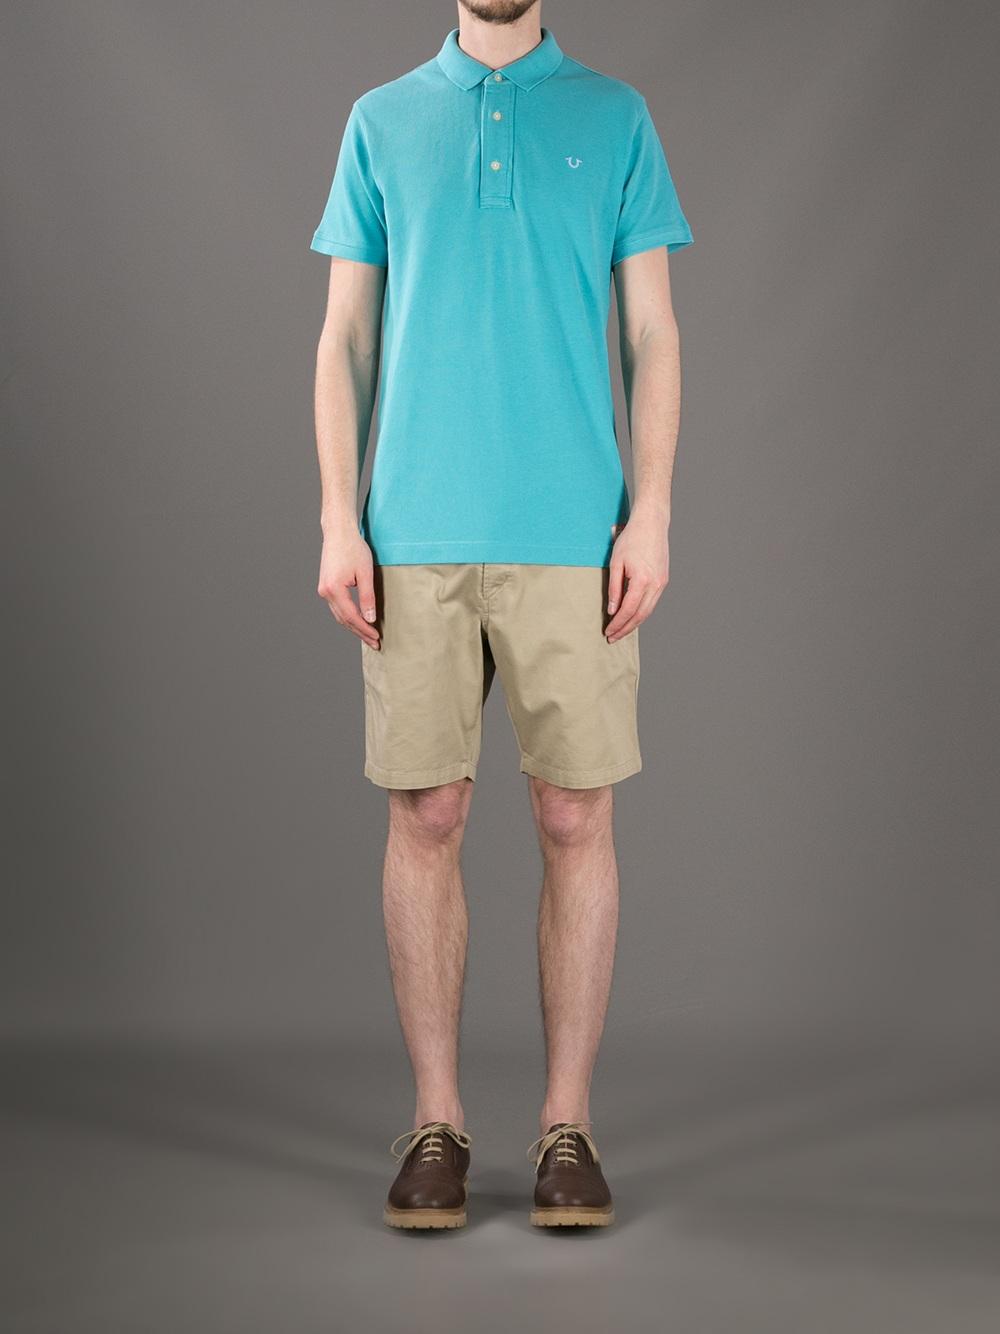 Denver Broncos Shirts For Men